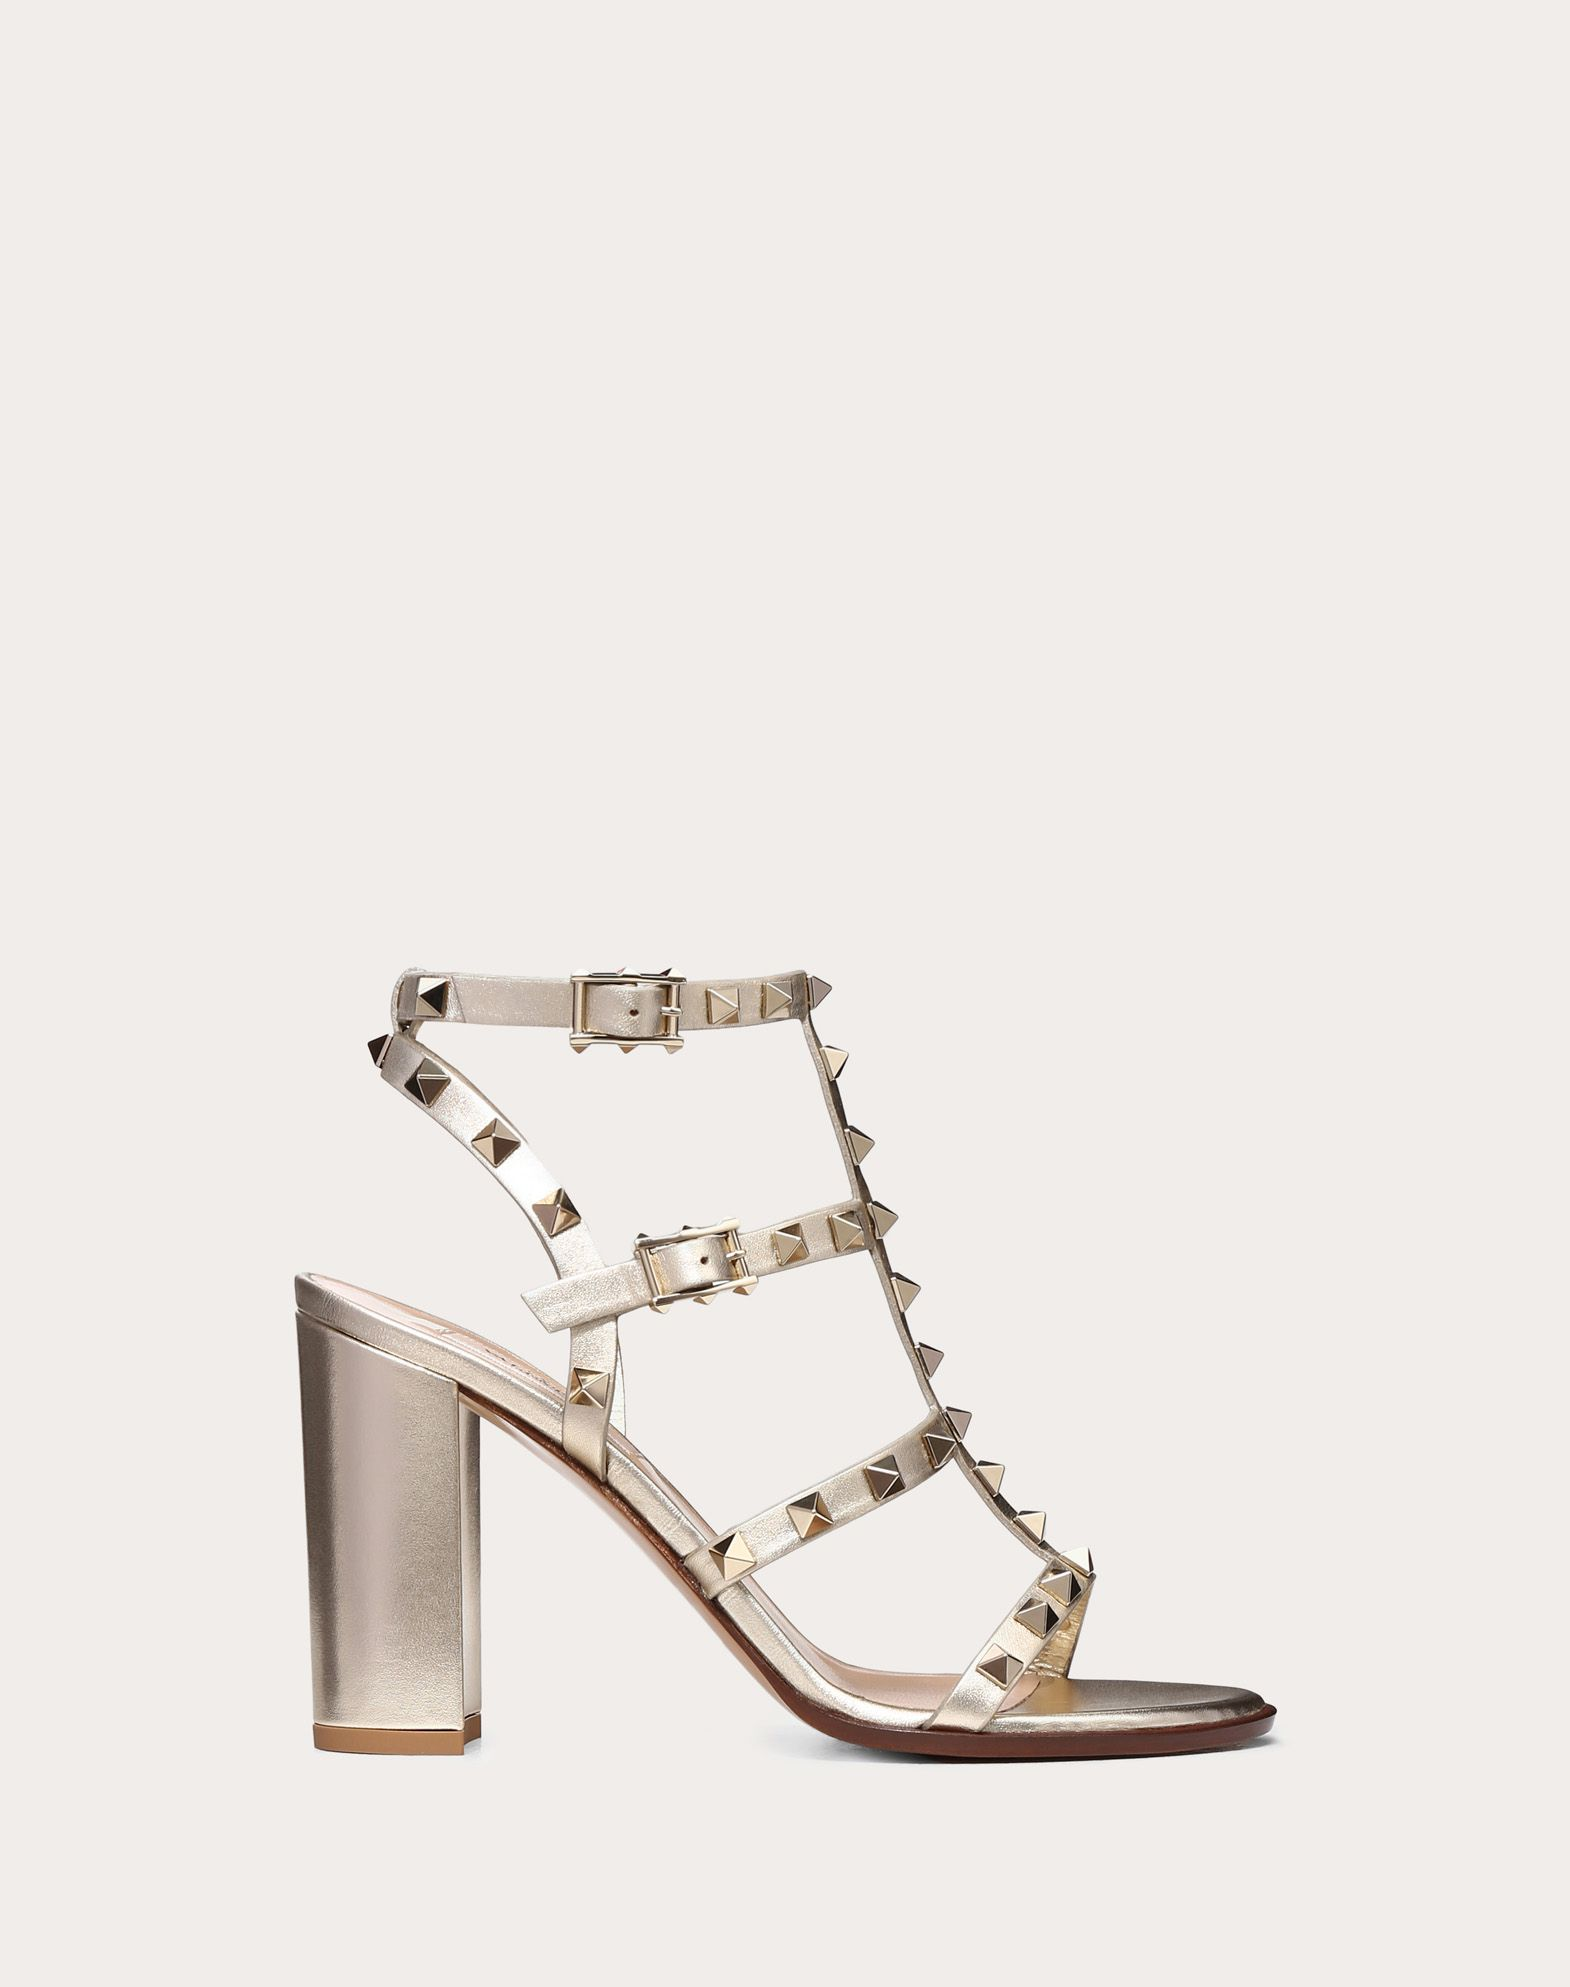 VALENTINO GARAVANI Rockstud Sandal HIGH HEEL SANDALS D f